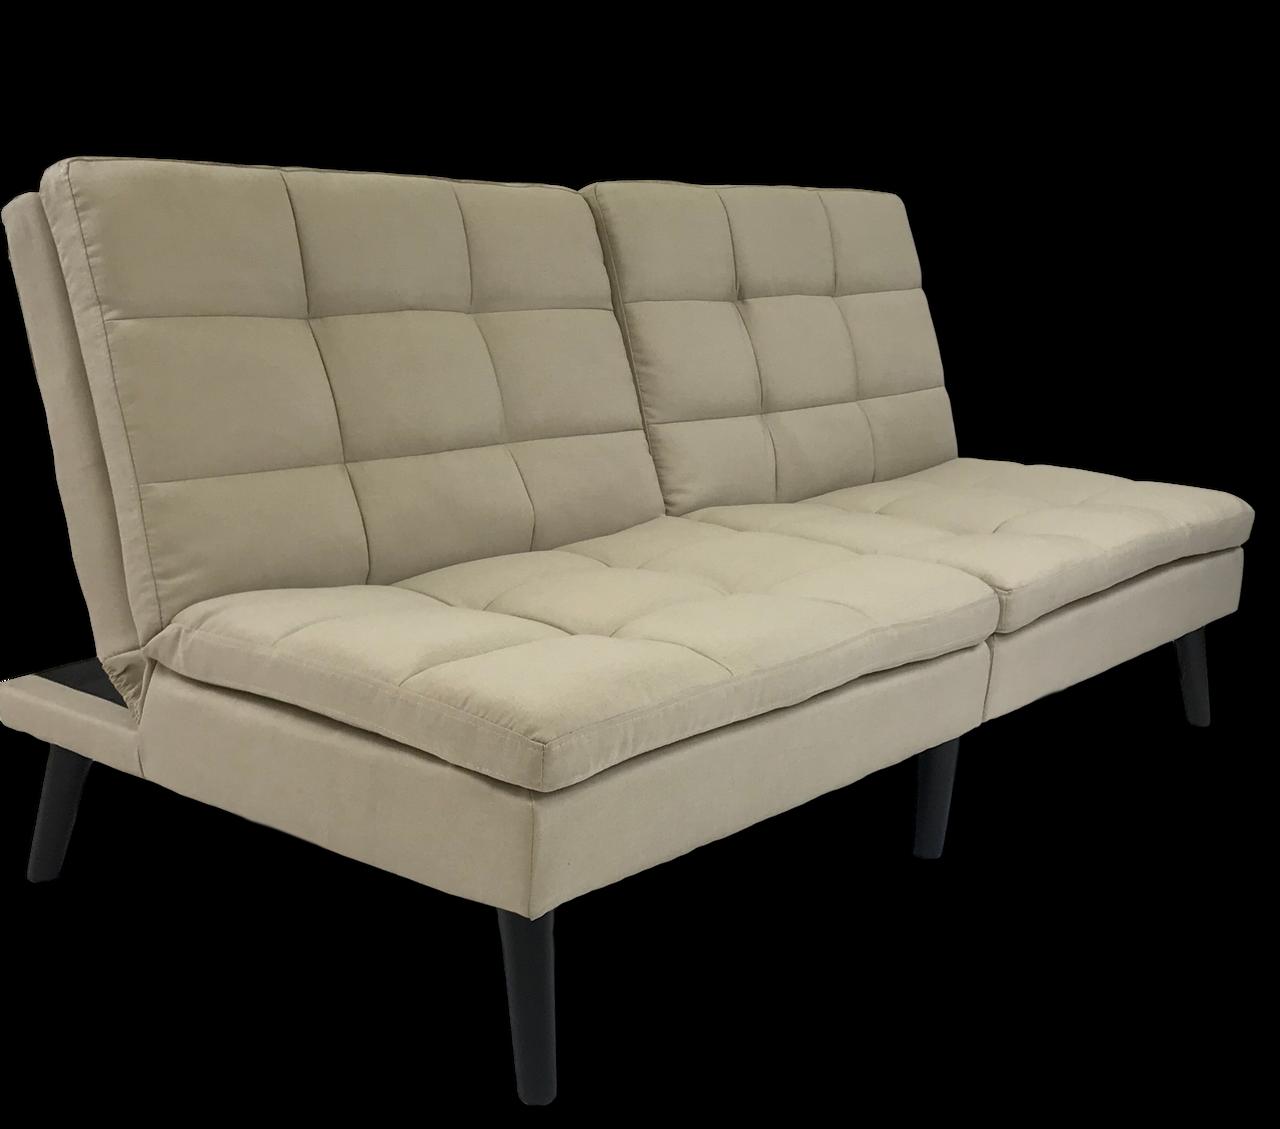 bed futons mattresses shikibuton natural product eucalyptus divan sofa d japanese futon matelas tatami japonnais or